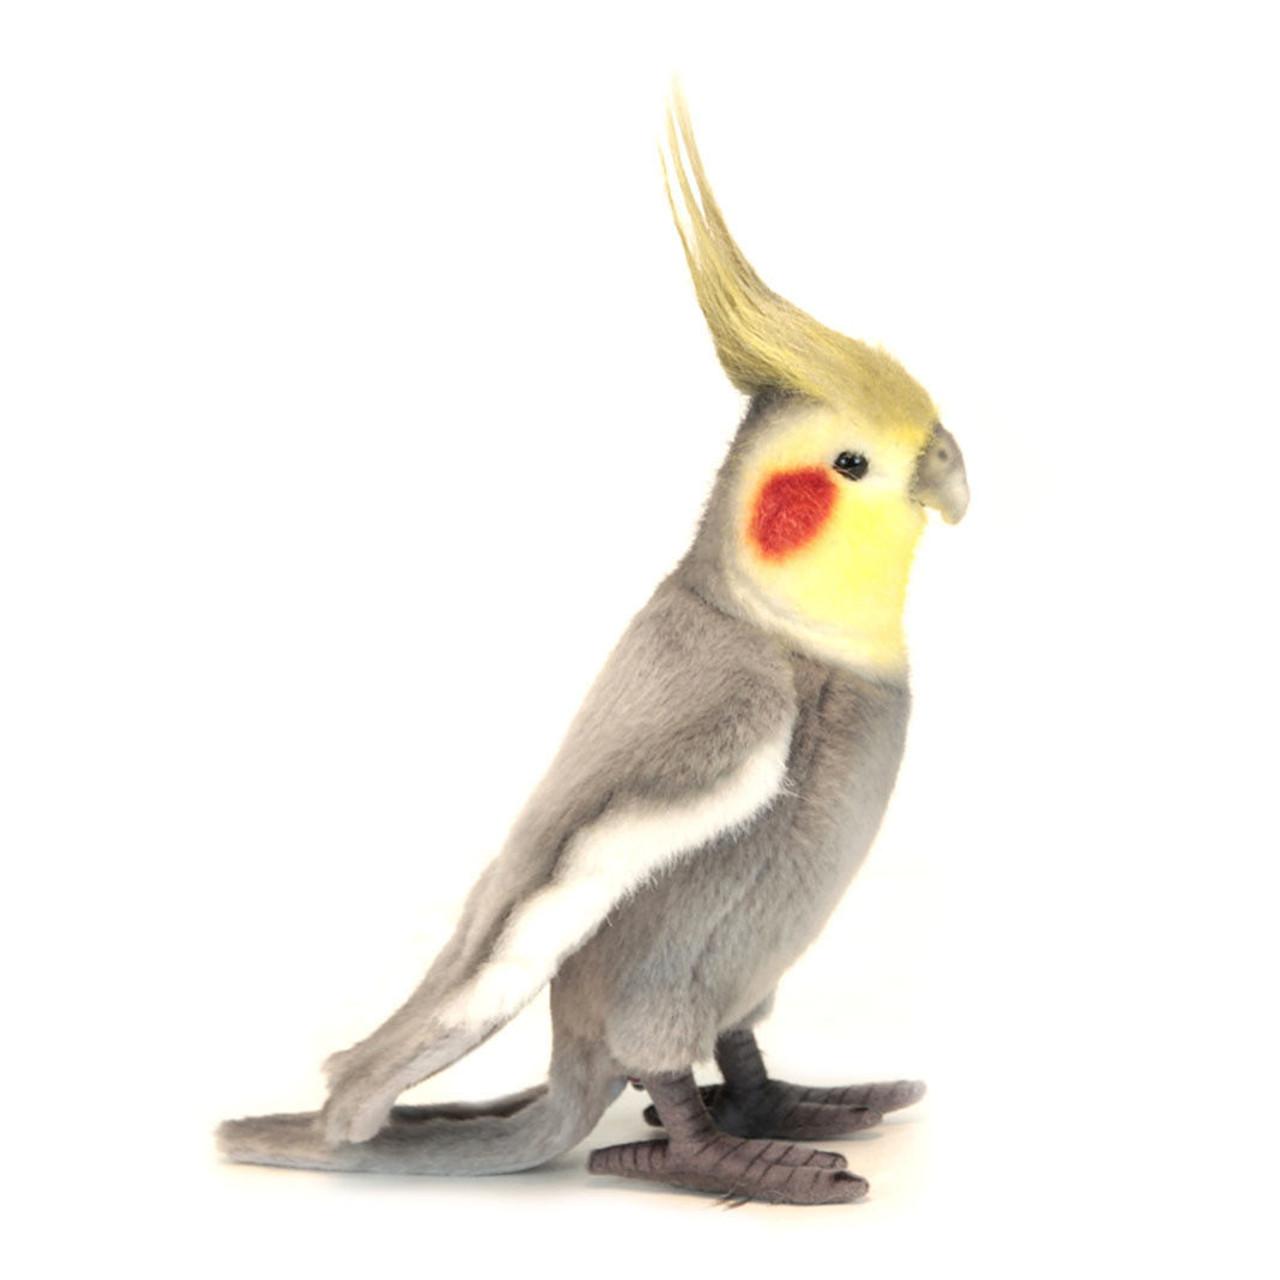 Cockatiel Bird Stuffed Animal Plush Toy Grey, Hansa 23cm